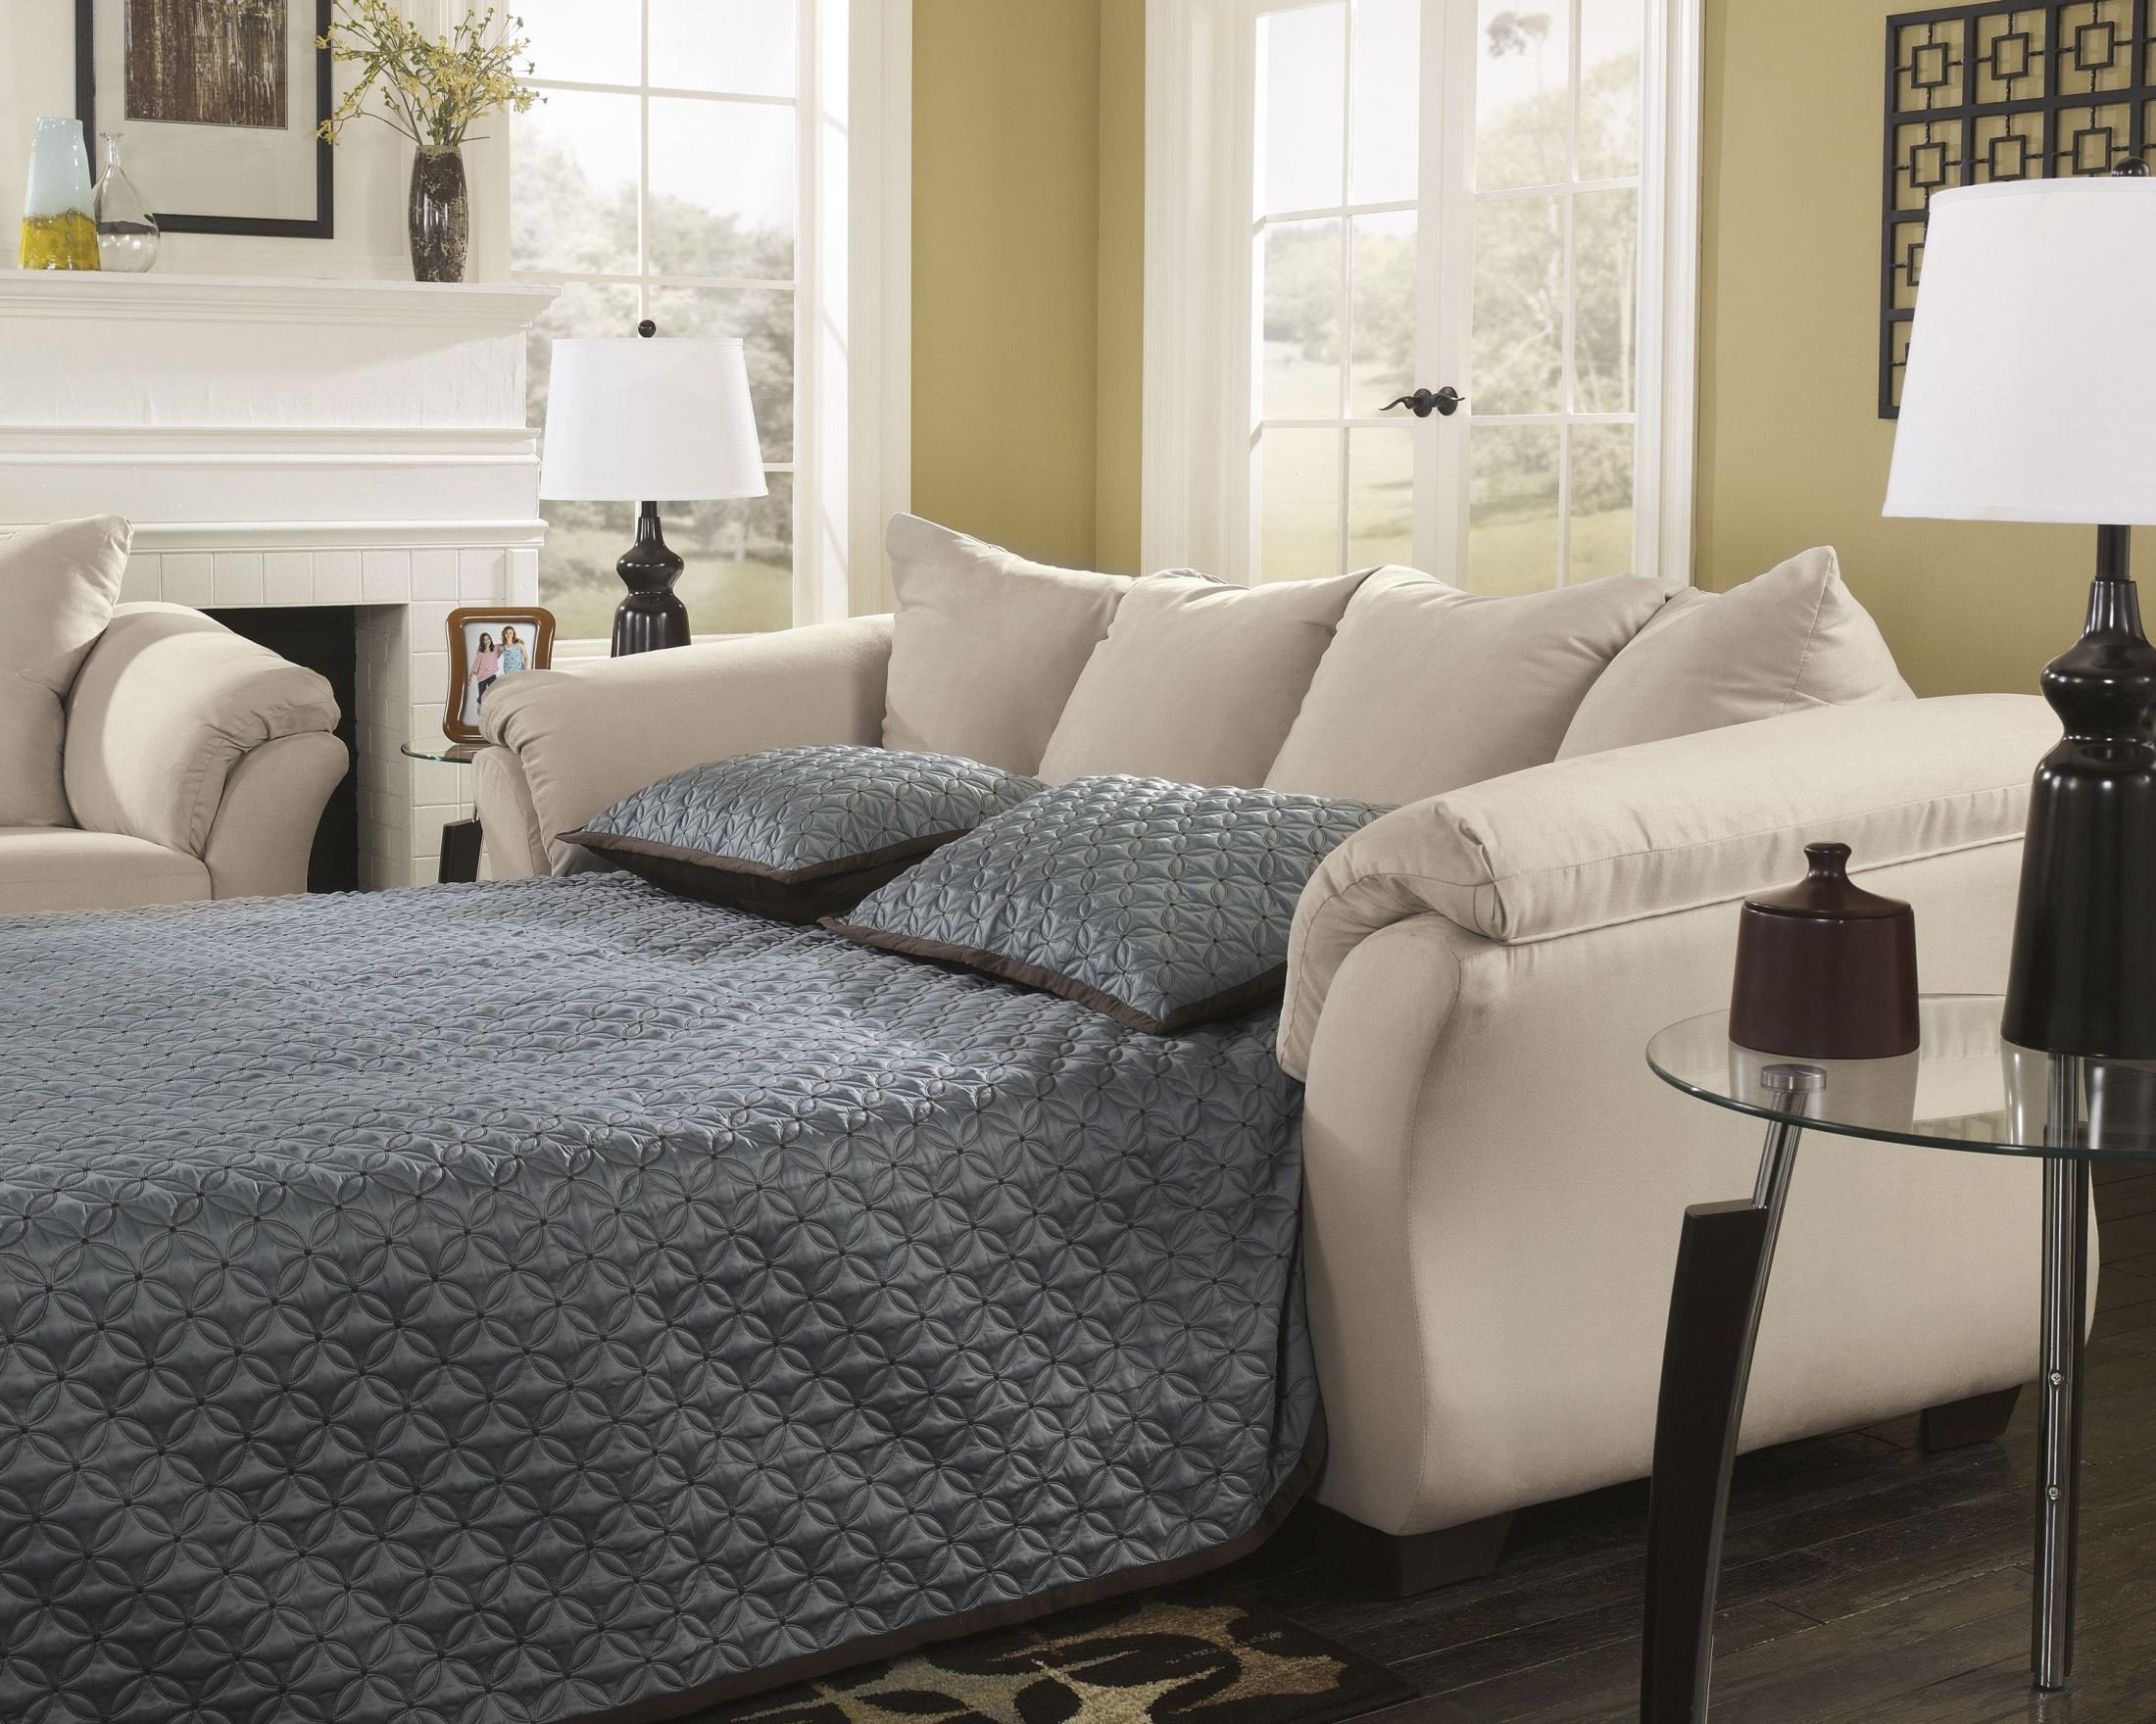 darcy sofa chaise ashley furniture cama precio panama stone full sleeper from 7500058